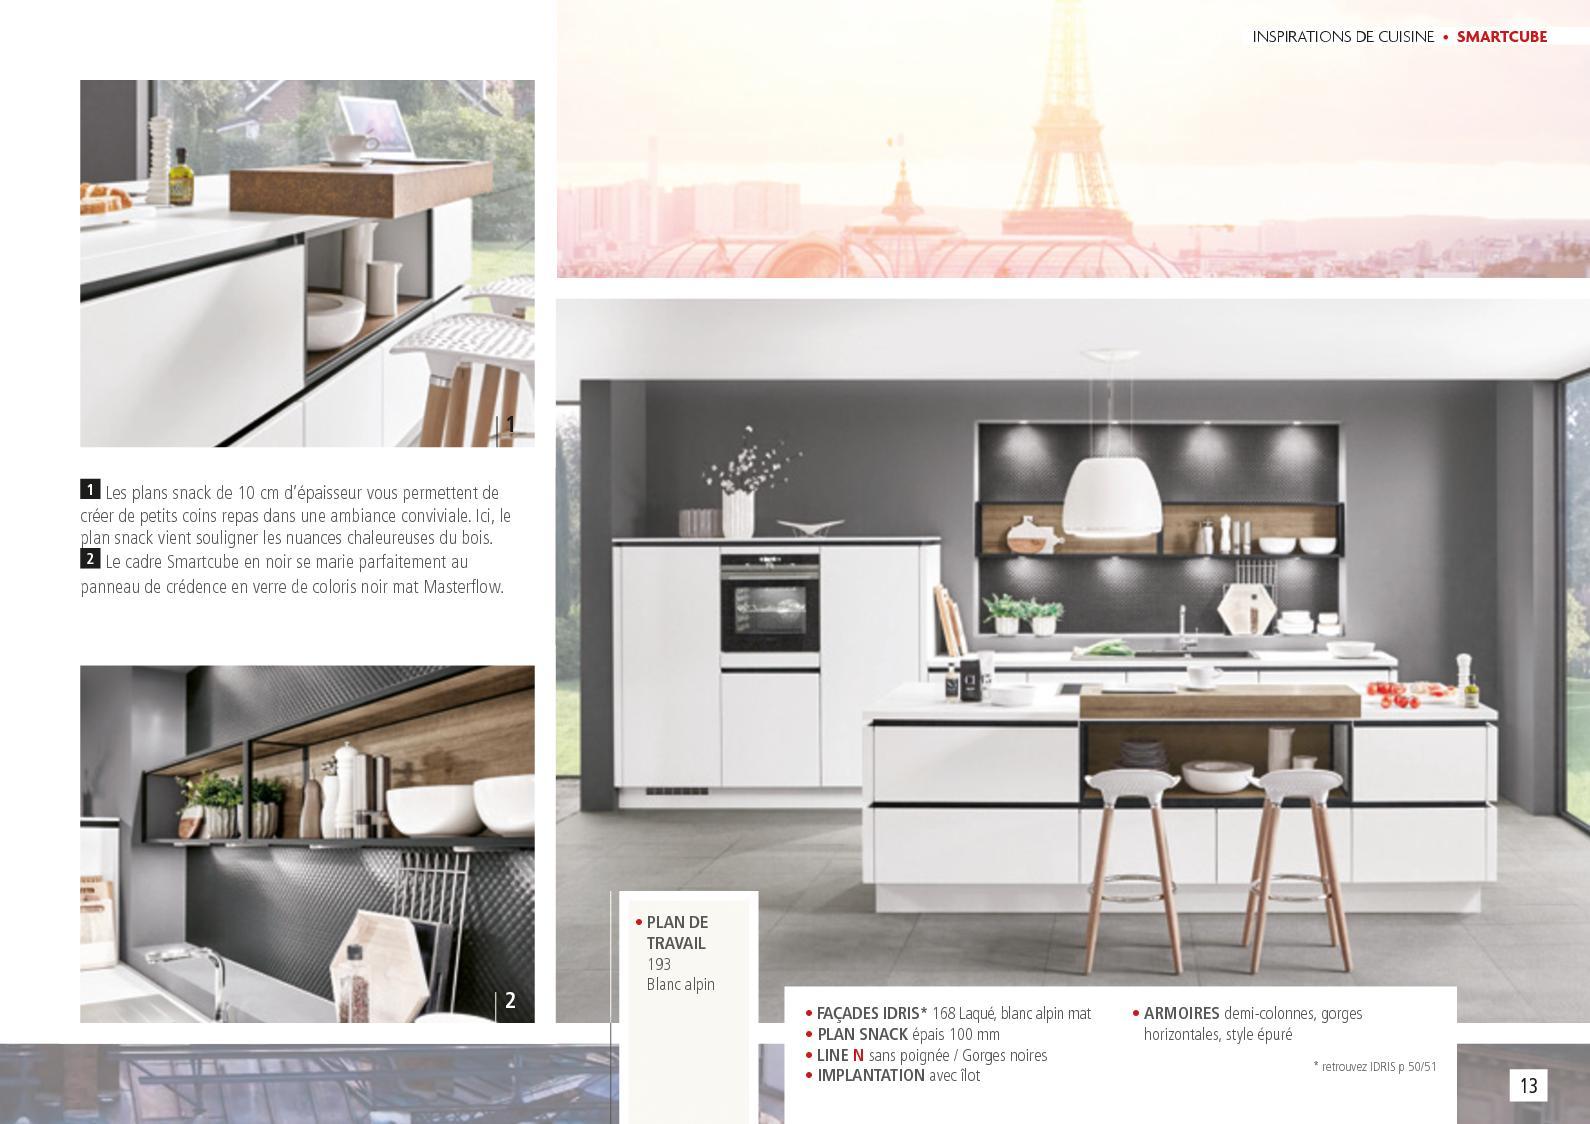 Credence Verre Ilot Central catalogue cuisine zelig 2018 - calameo downloader